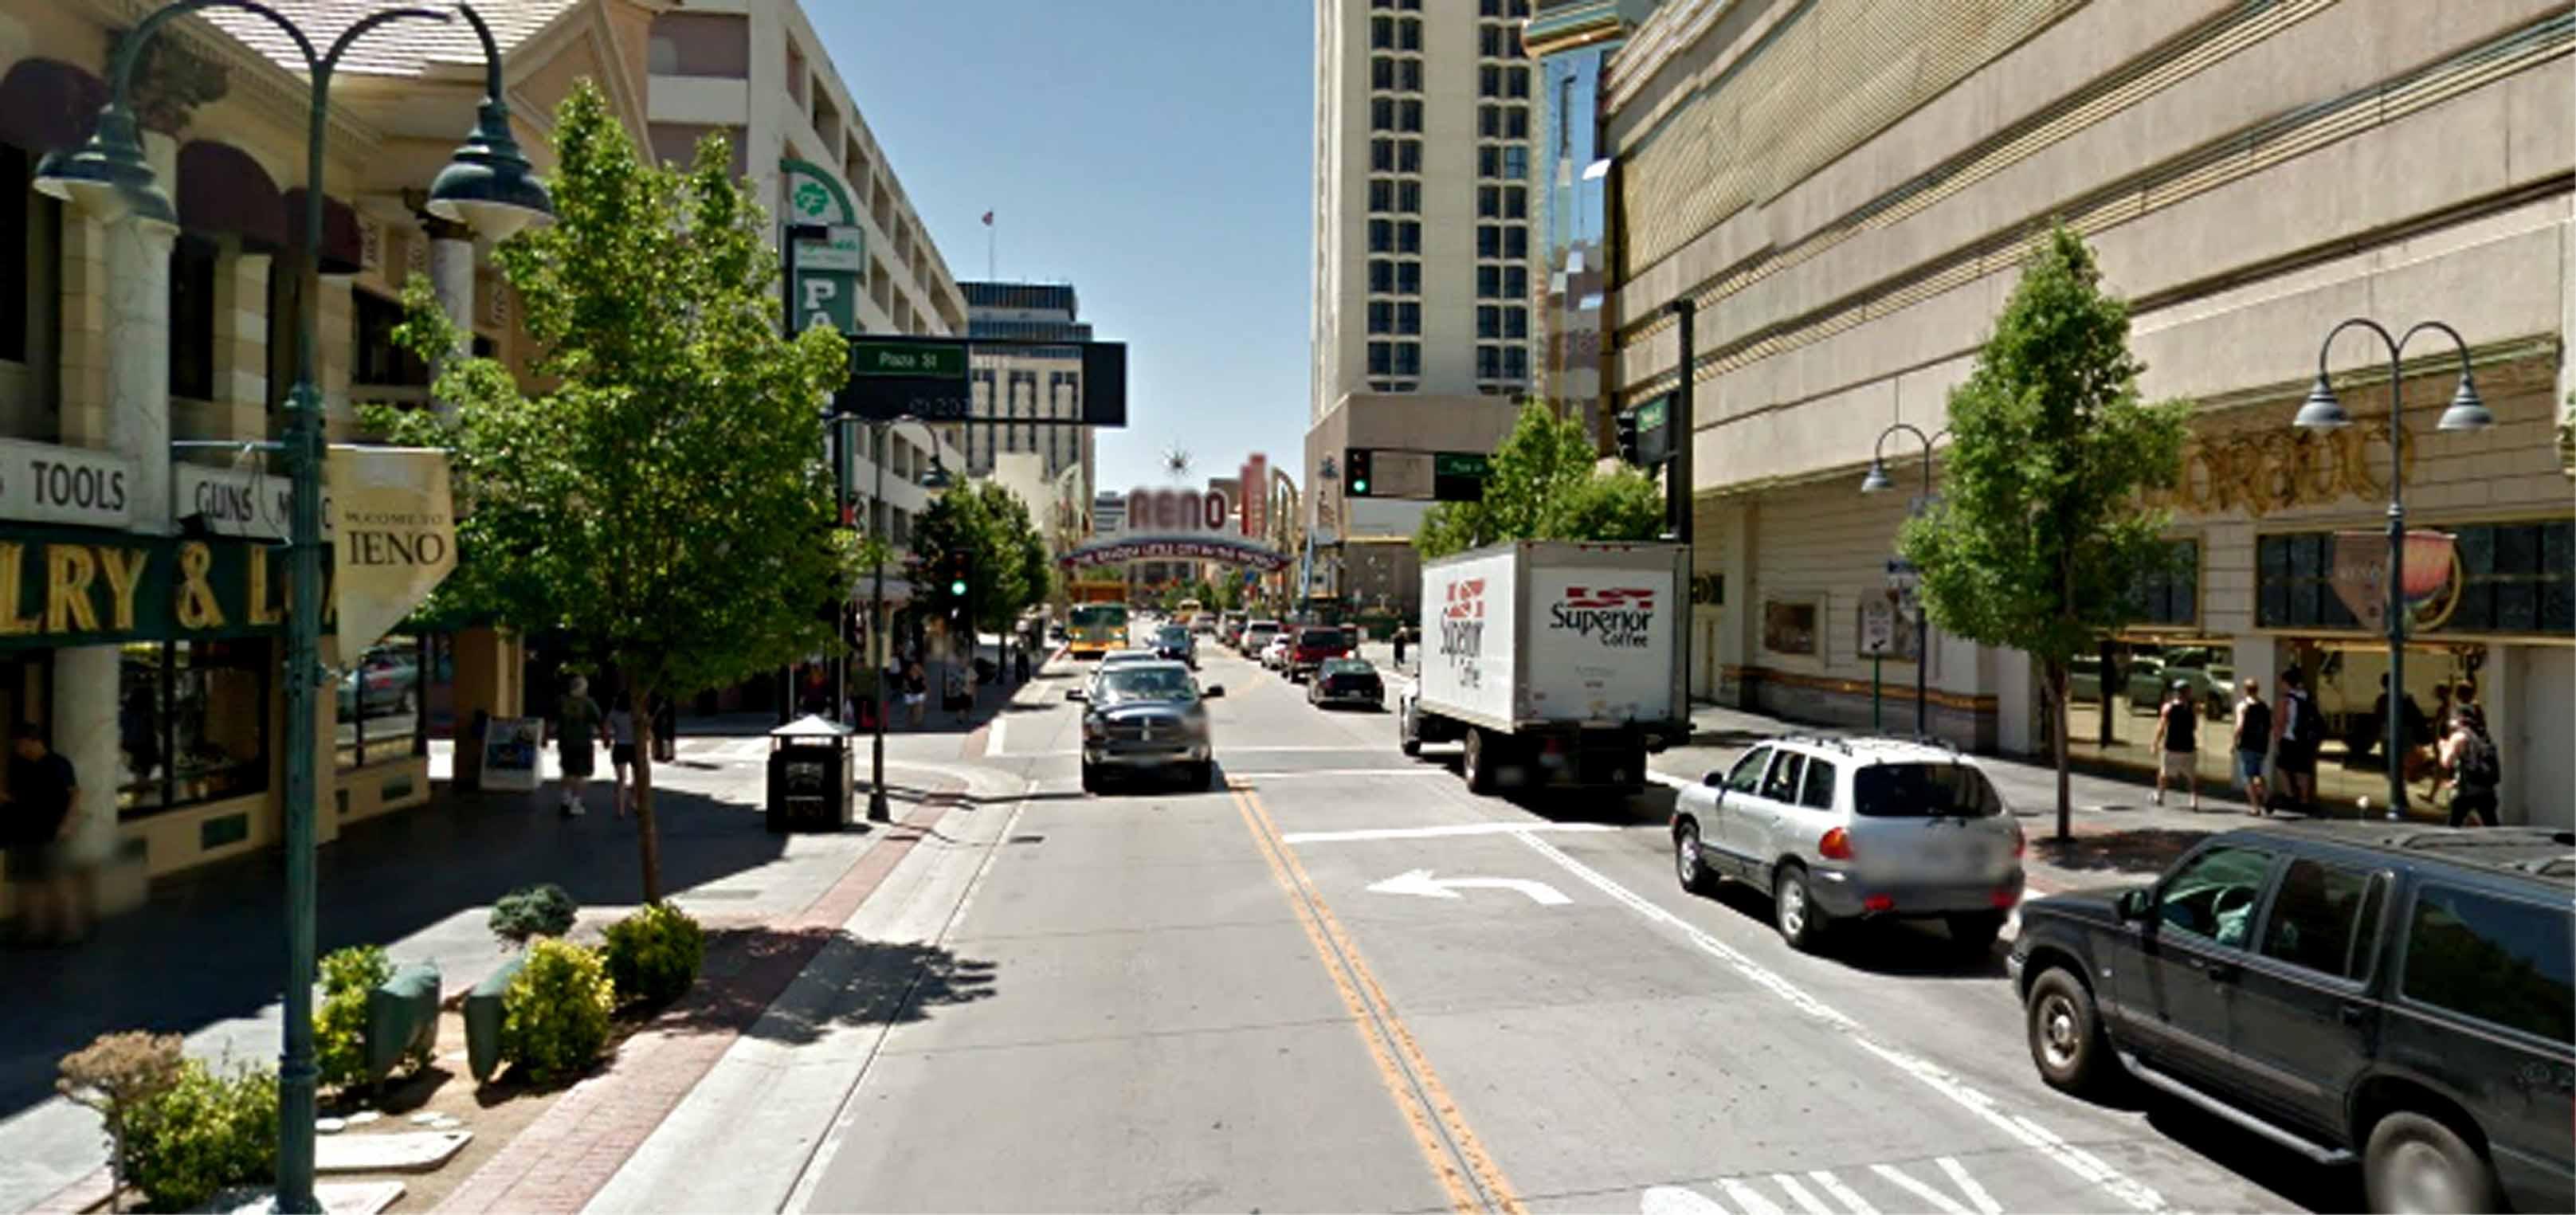 View Captured Google Street